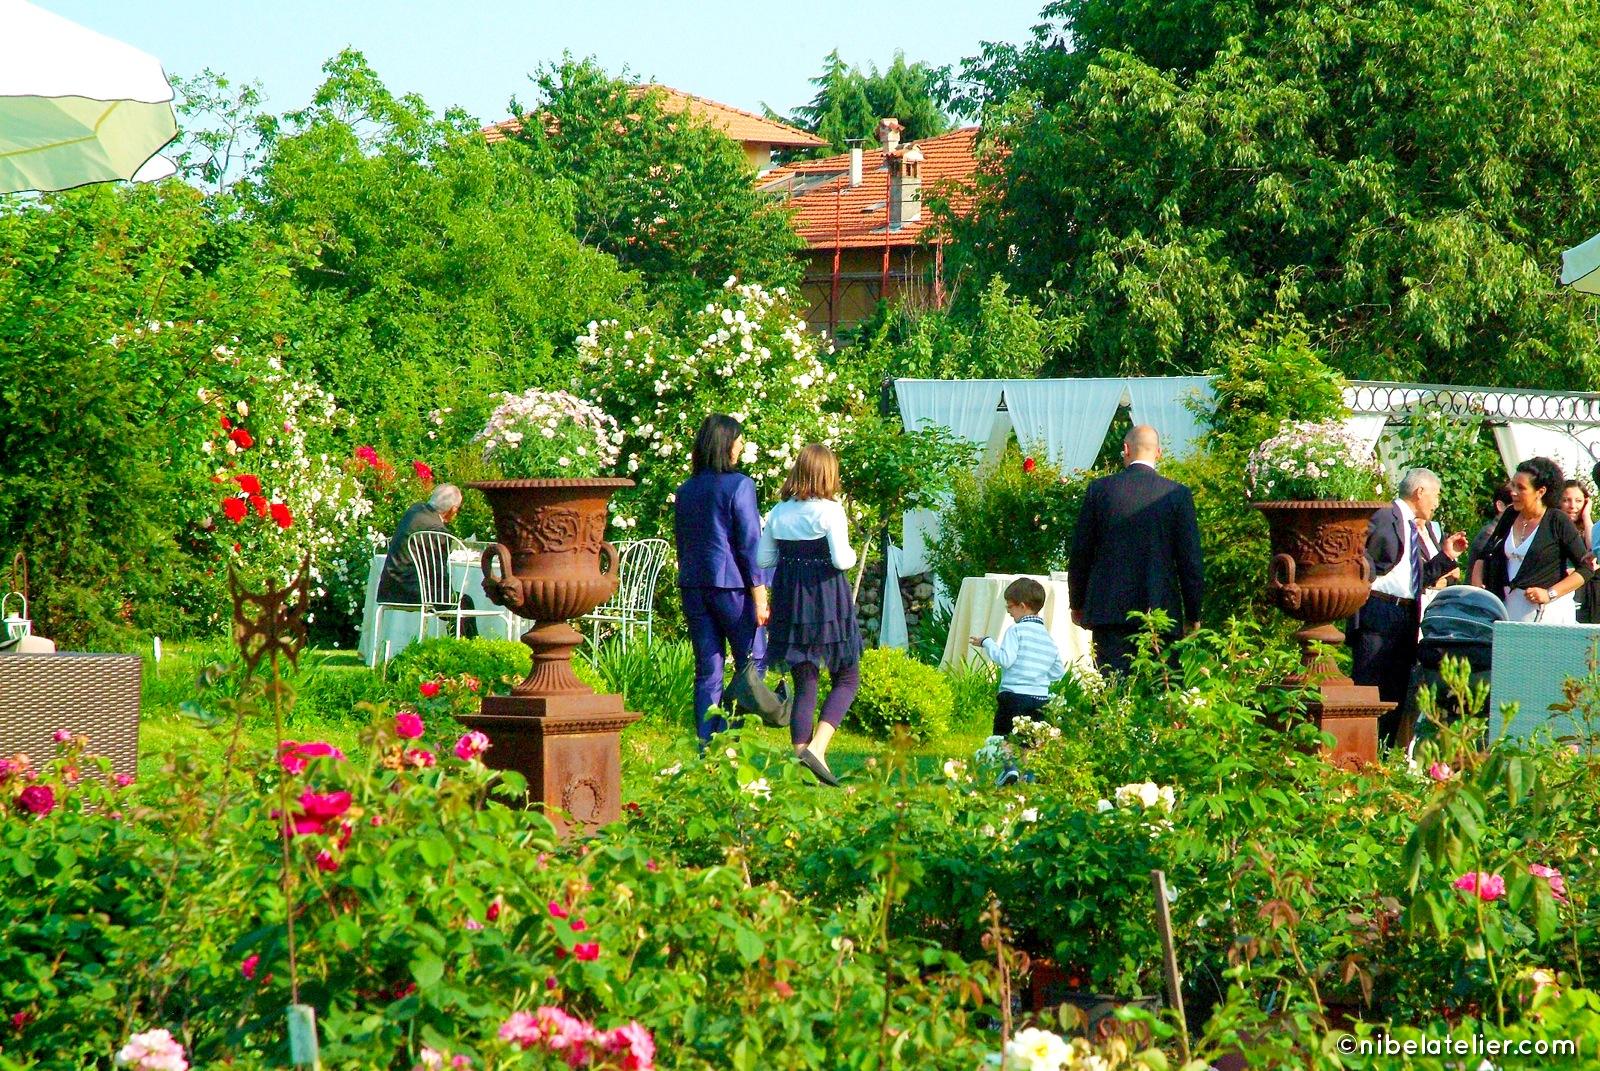 024-giardino-castello-quistini